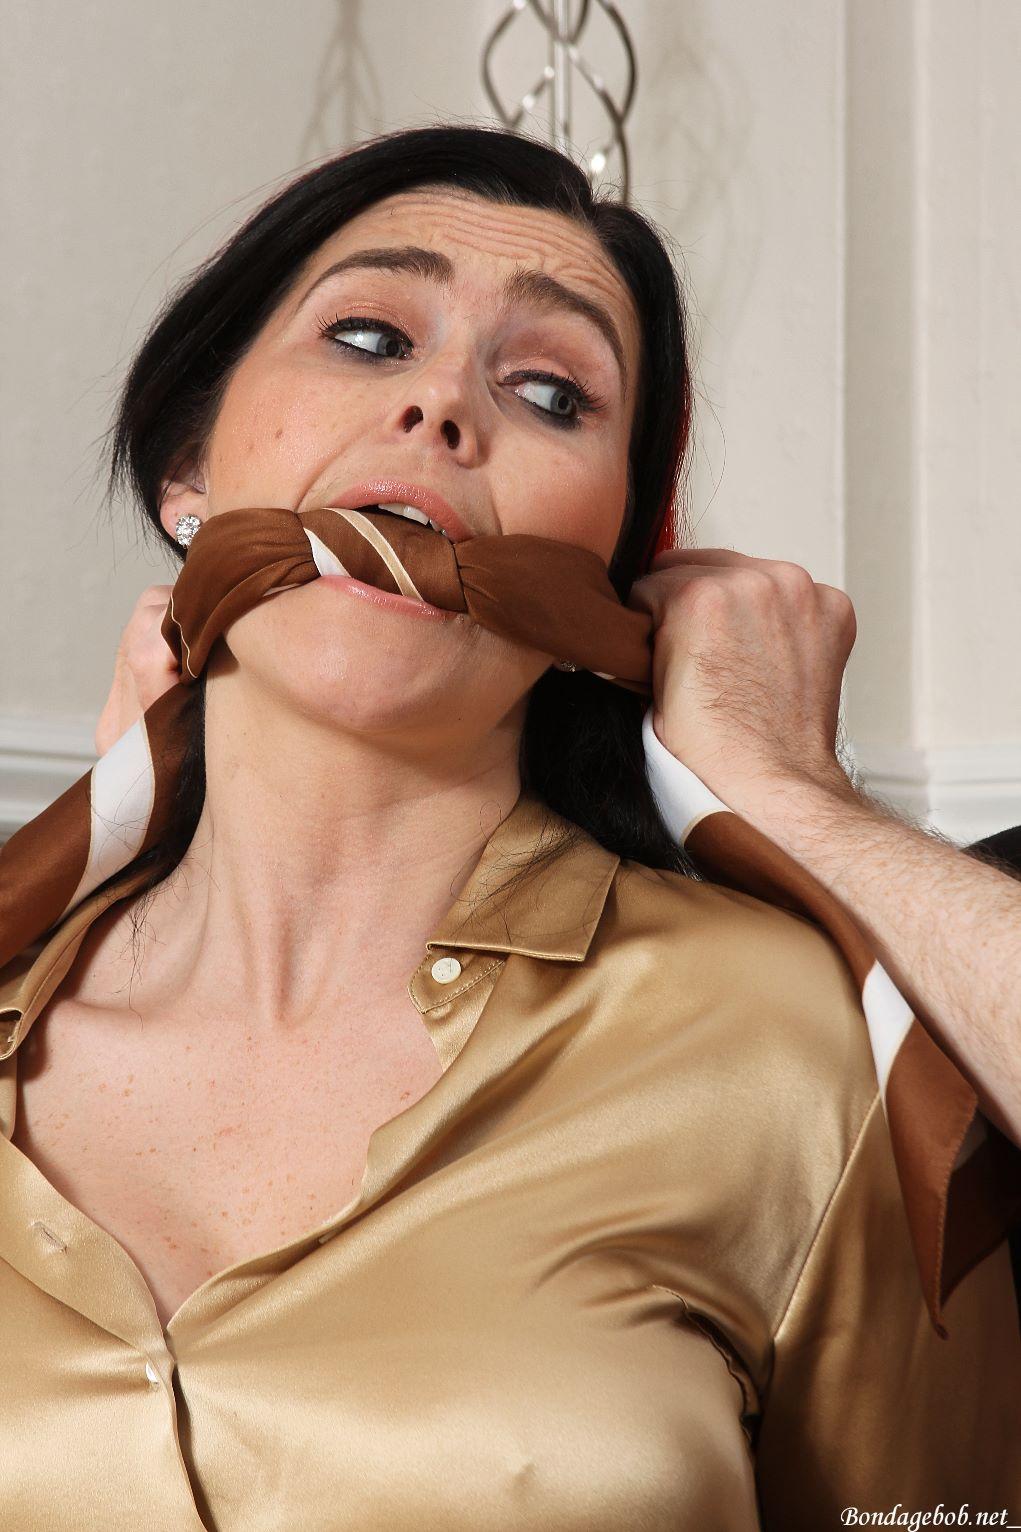 Roxi Keogh in bondage.